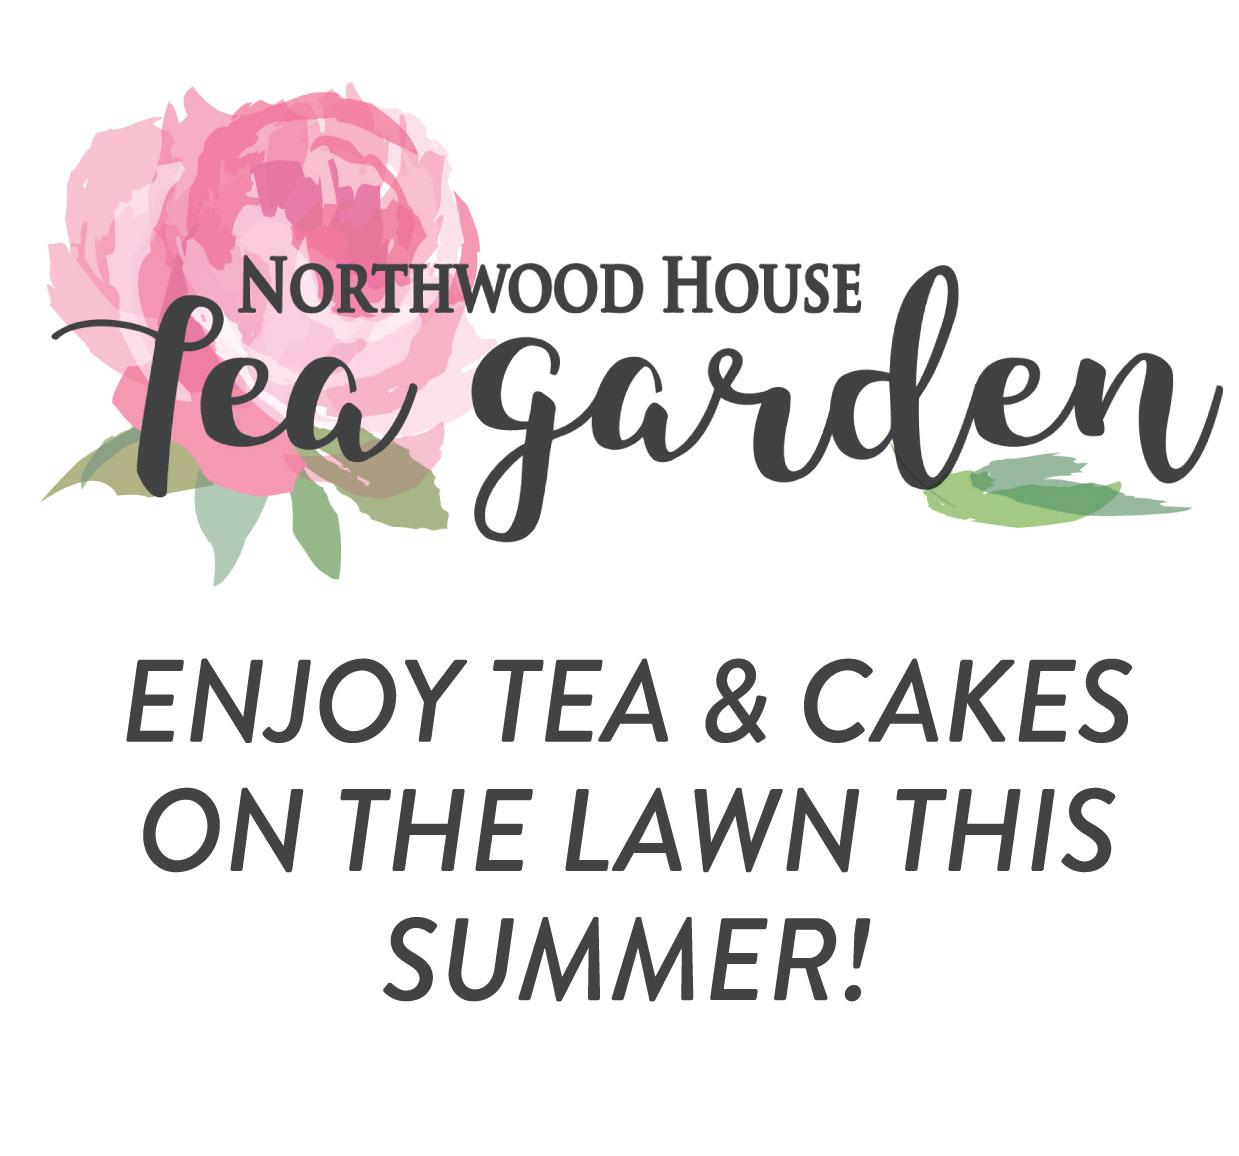 Northwood House Tea Garden (Whitsun Weekend & Summer Sundays)